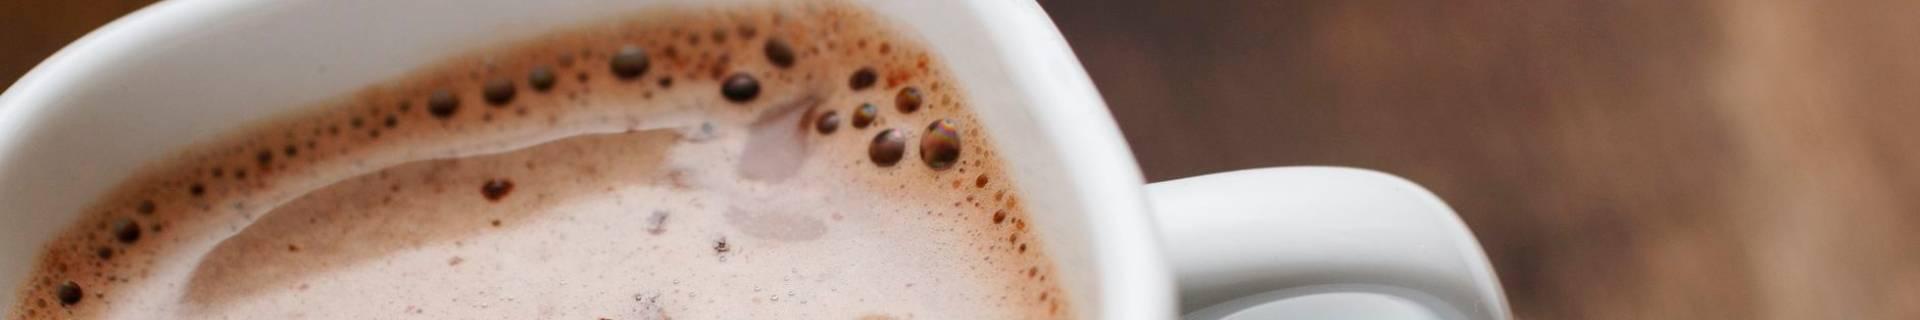 Café instantané bio - ECOLECTIA